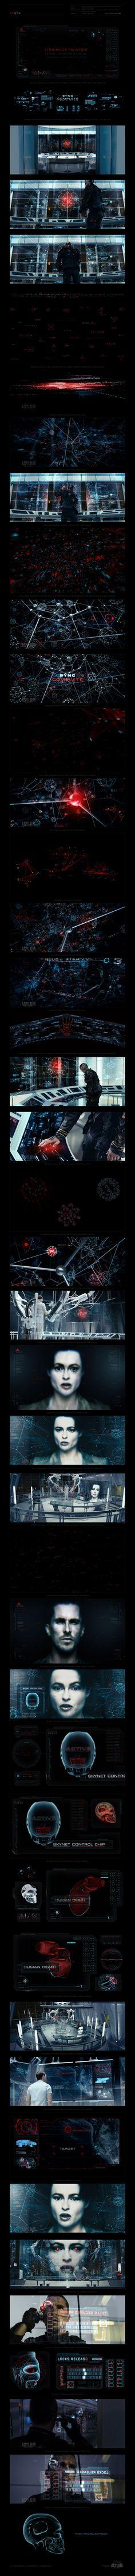 #Terminator Salvation. #UI